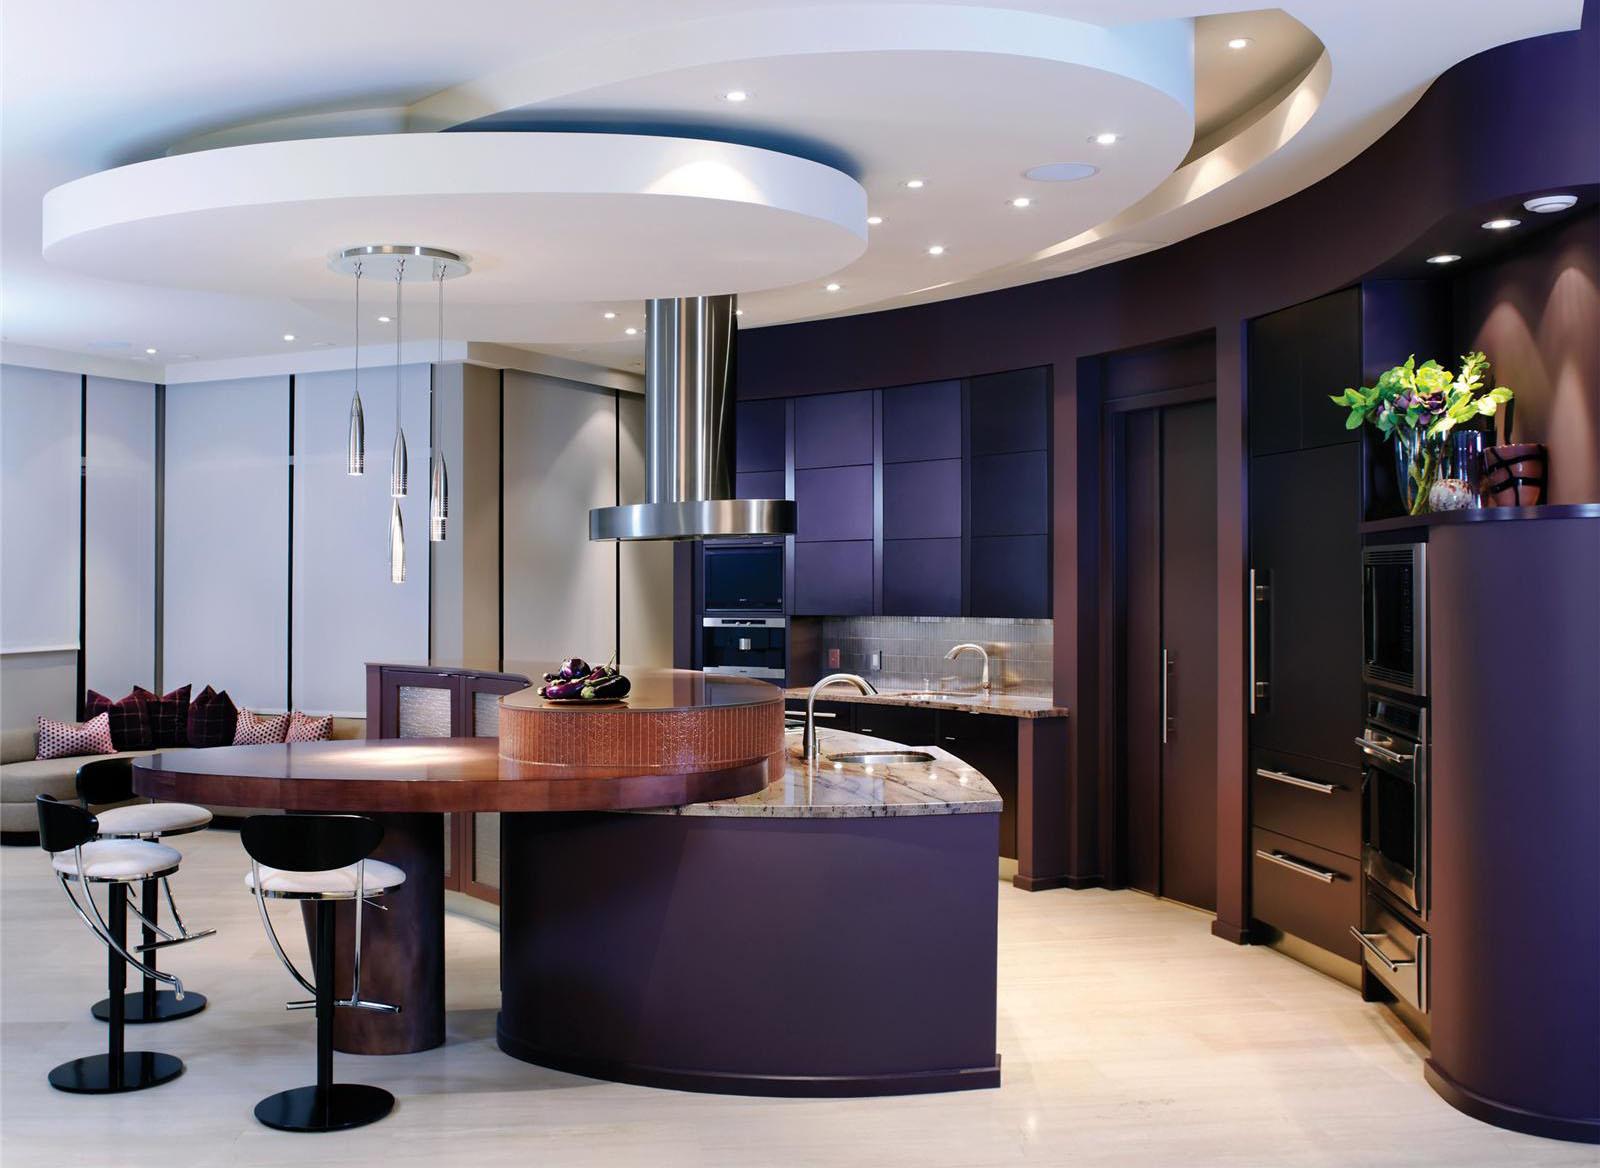 open contemporary kitchen design ideas open kitchen design Open Contemporary Kitchen Design Ideas